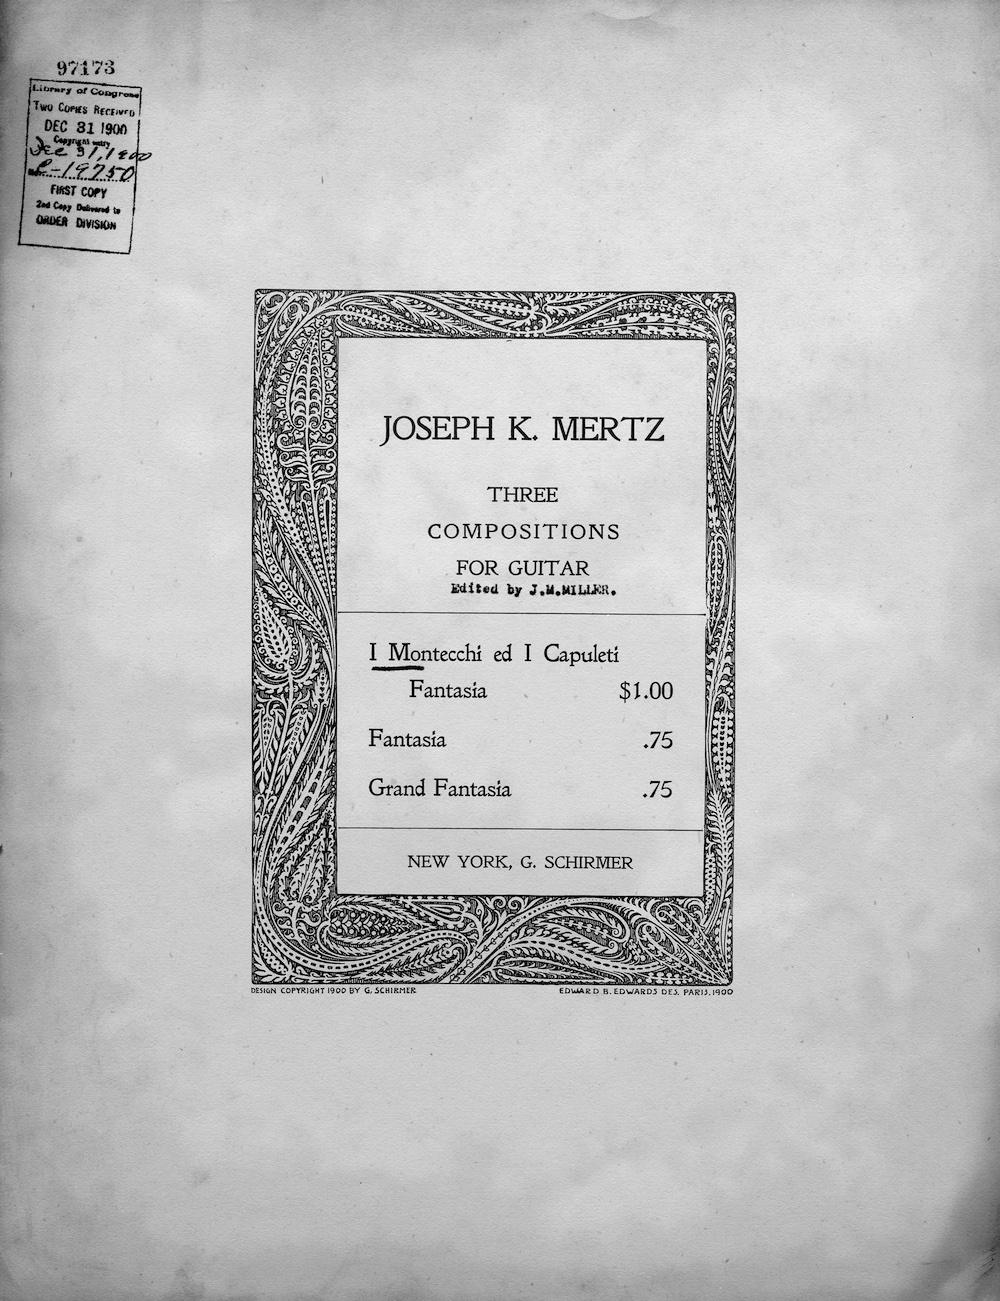 J. K. Mertz – Johann or Joseph? – research by Masami Kimura